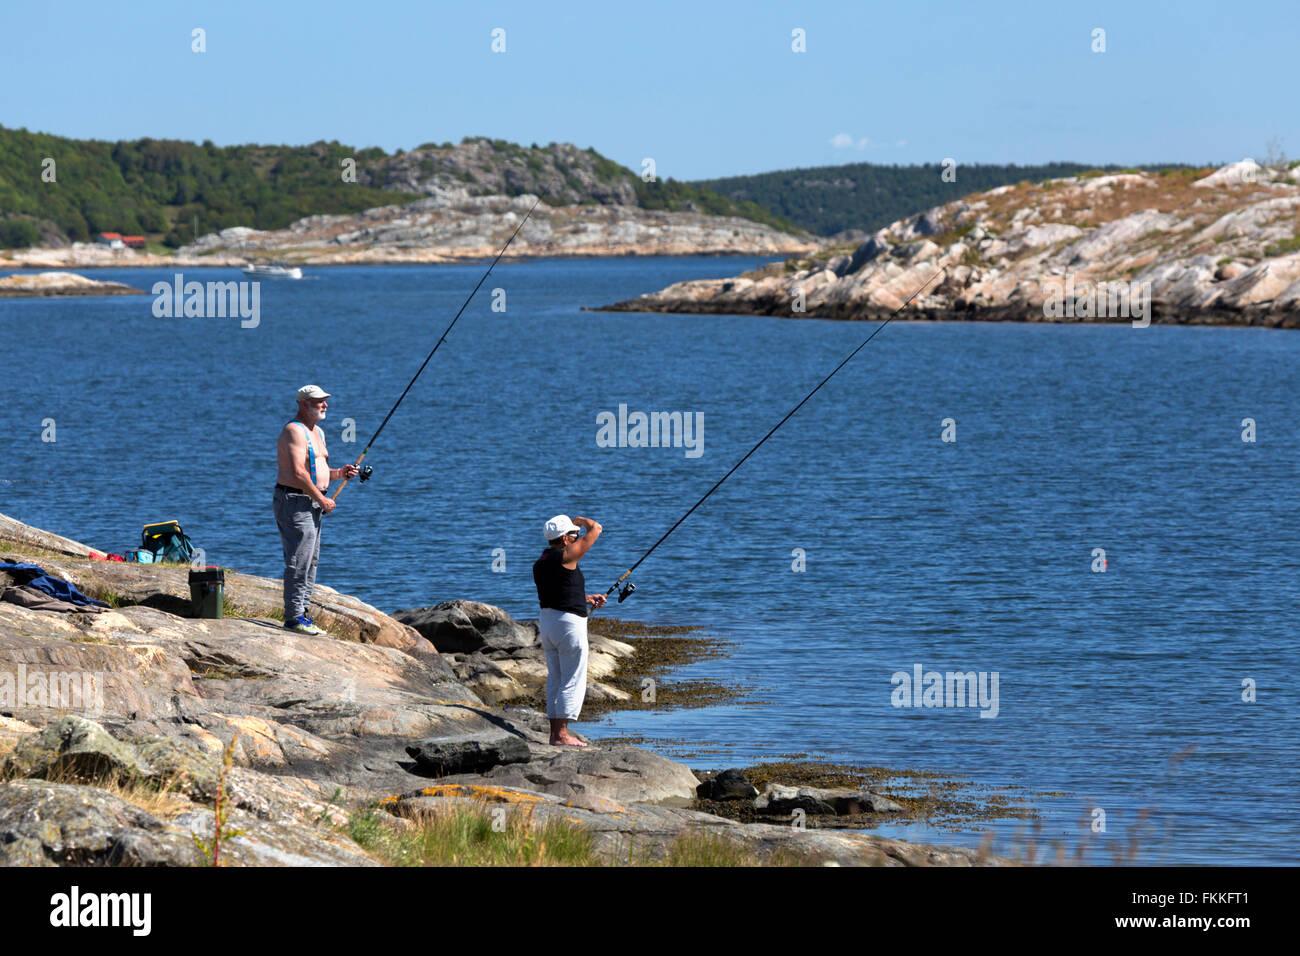 Fishing from rocky coastline, near Marstrand, Southwest Sweden, Sweden, Scandinavia, Europe - Stock Image